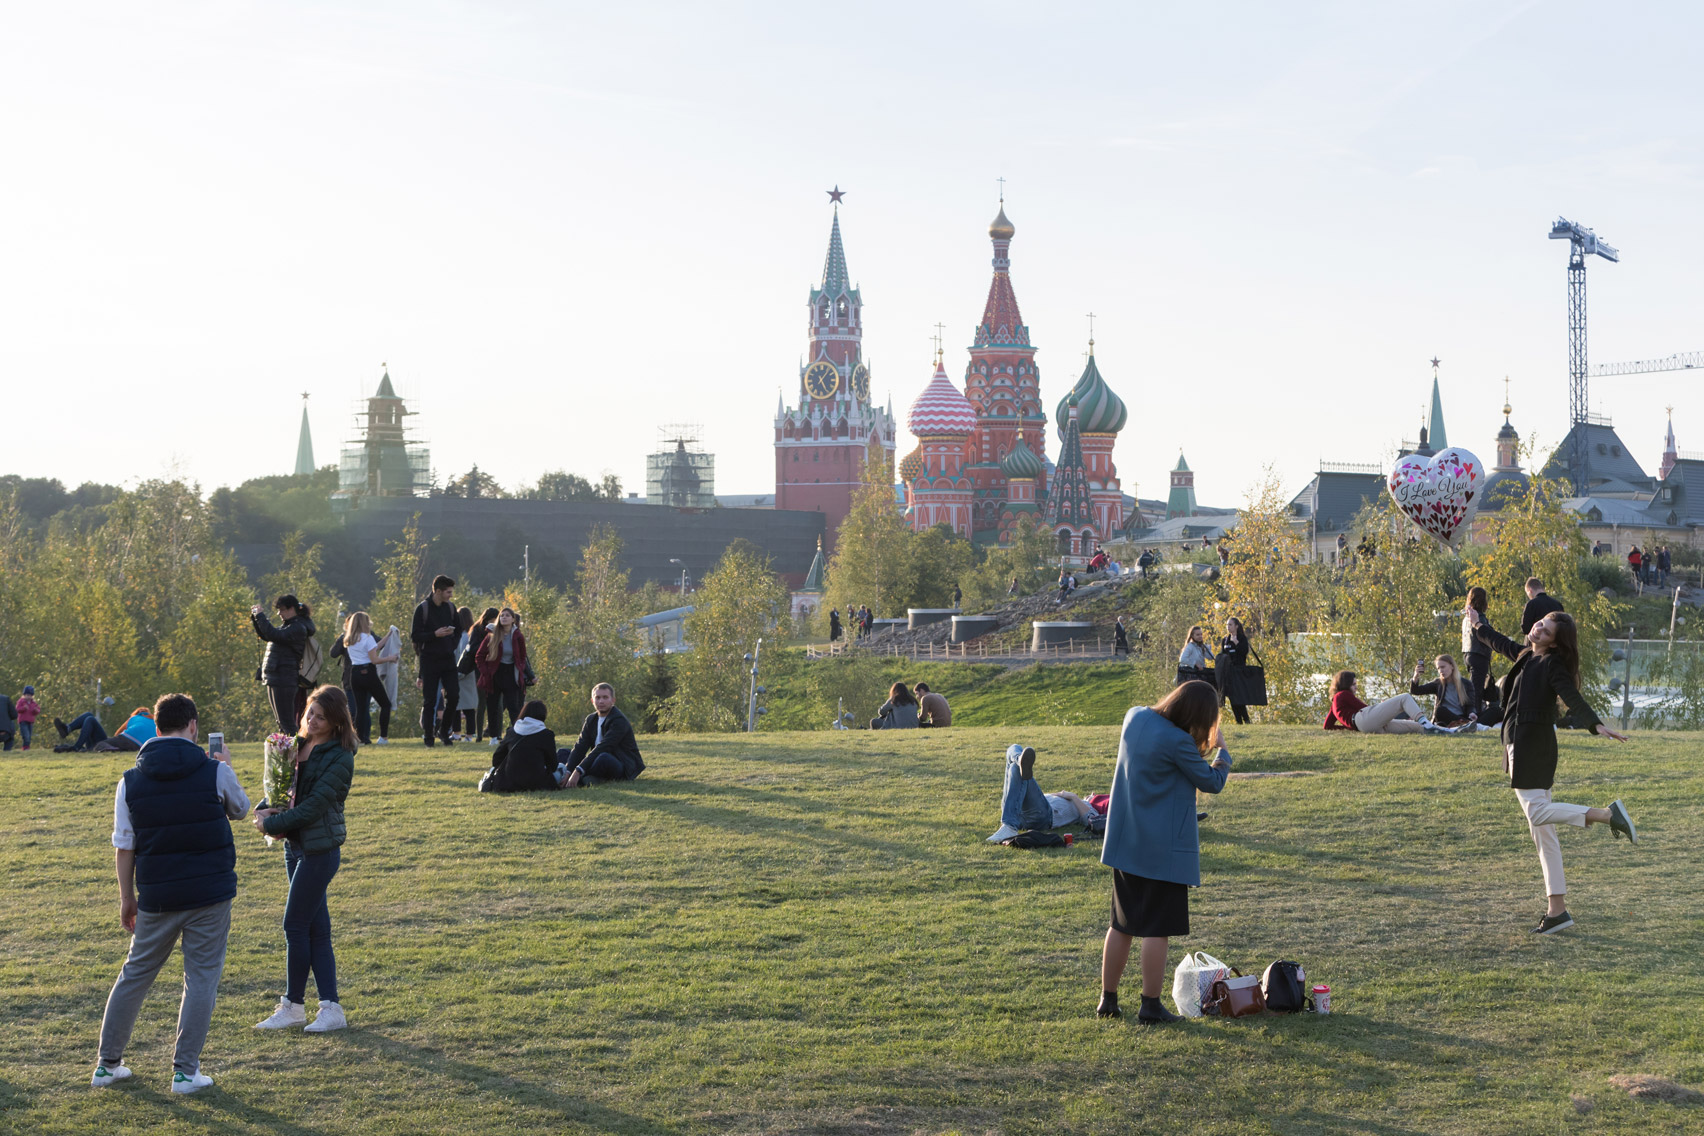 Zaryadye Park near the Kremlin in Moscow